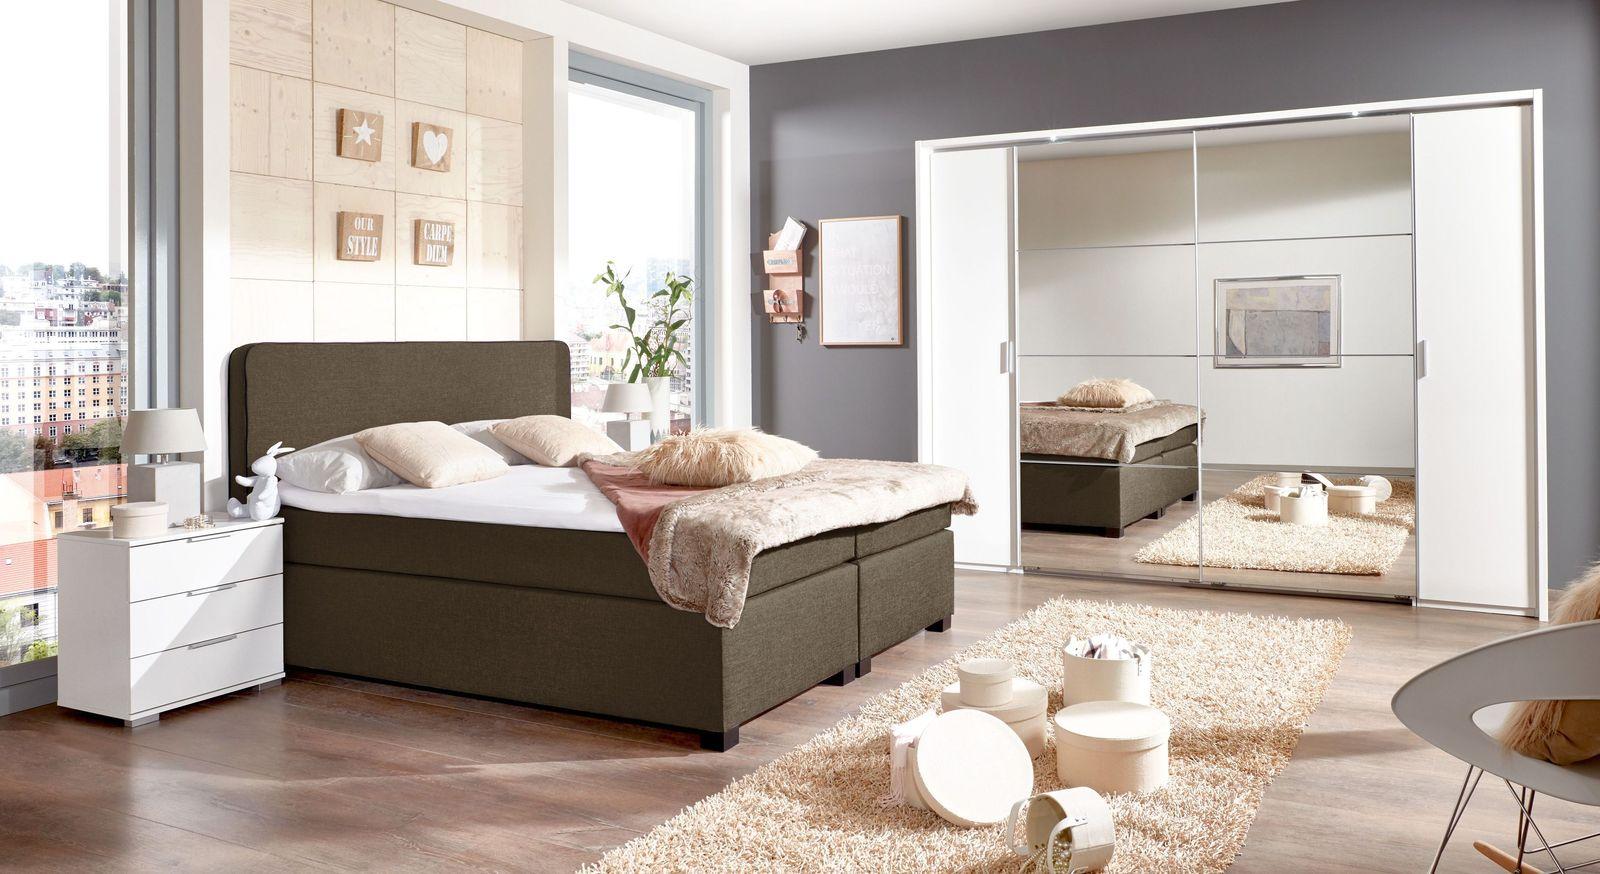 preiswertes komplett schlafzimmer mit boxspringbett maniago. Black Bedroom Furniture Sets. Home Design Ideas